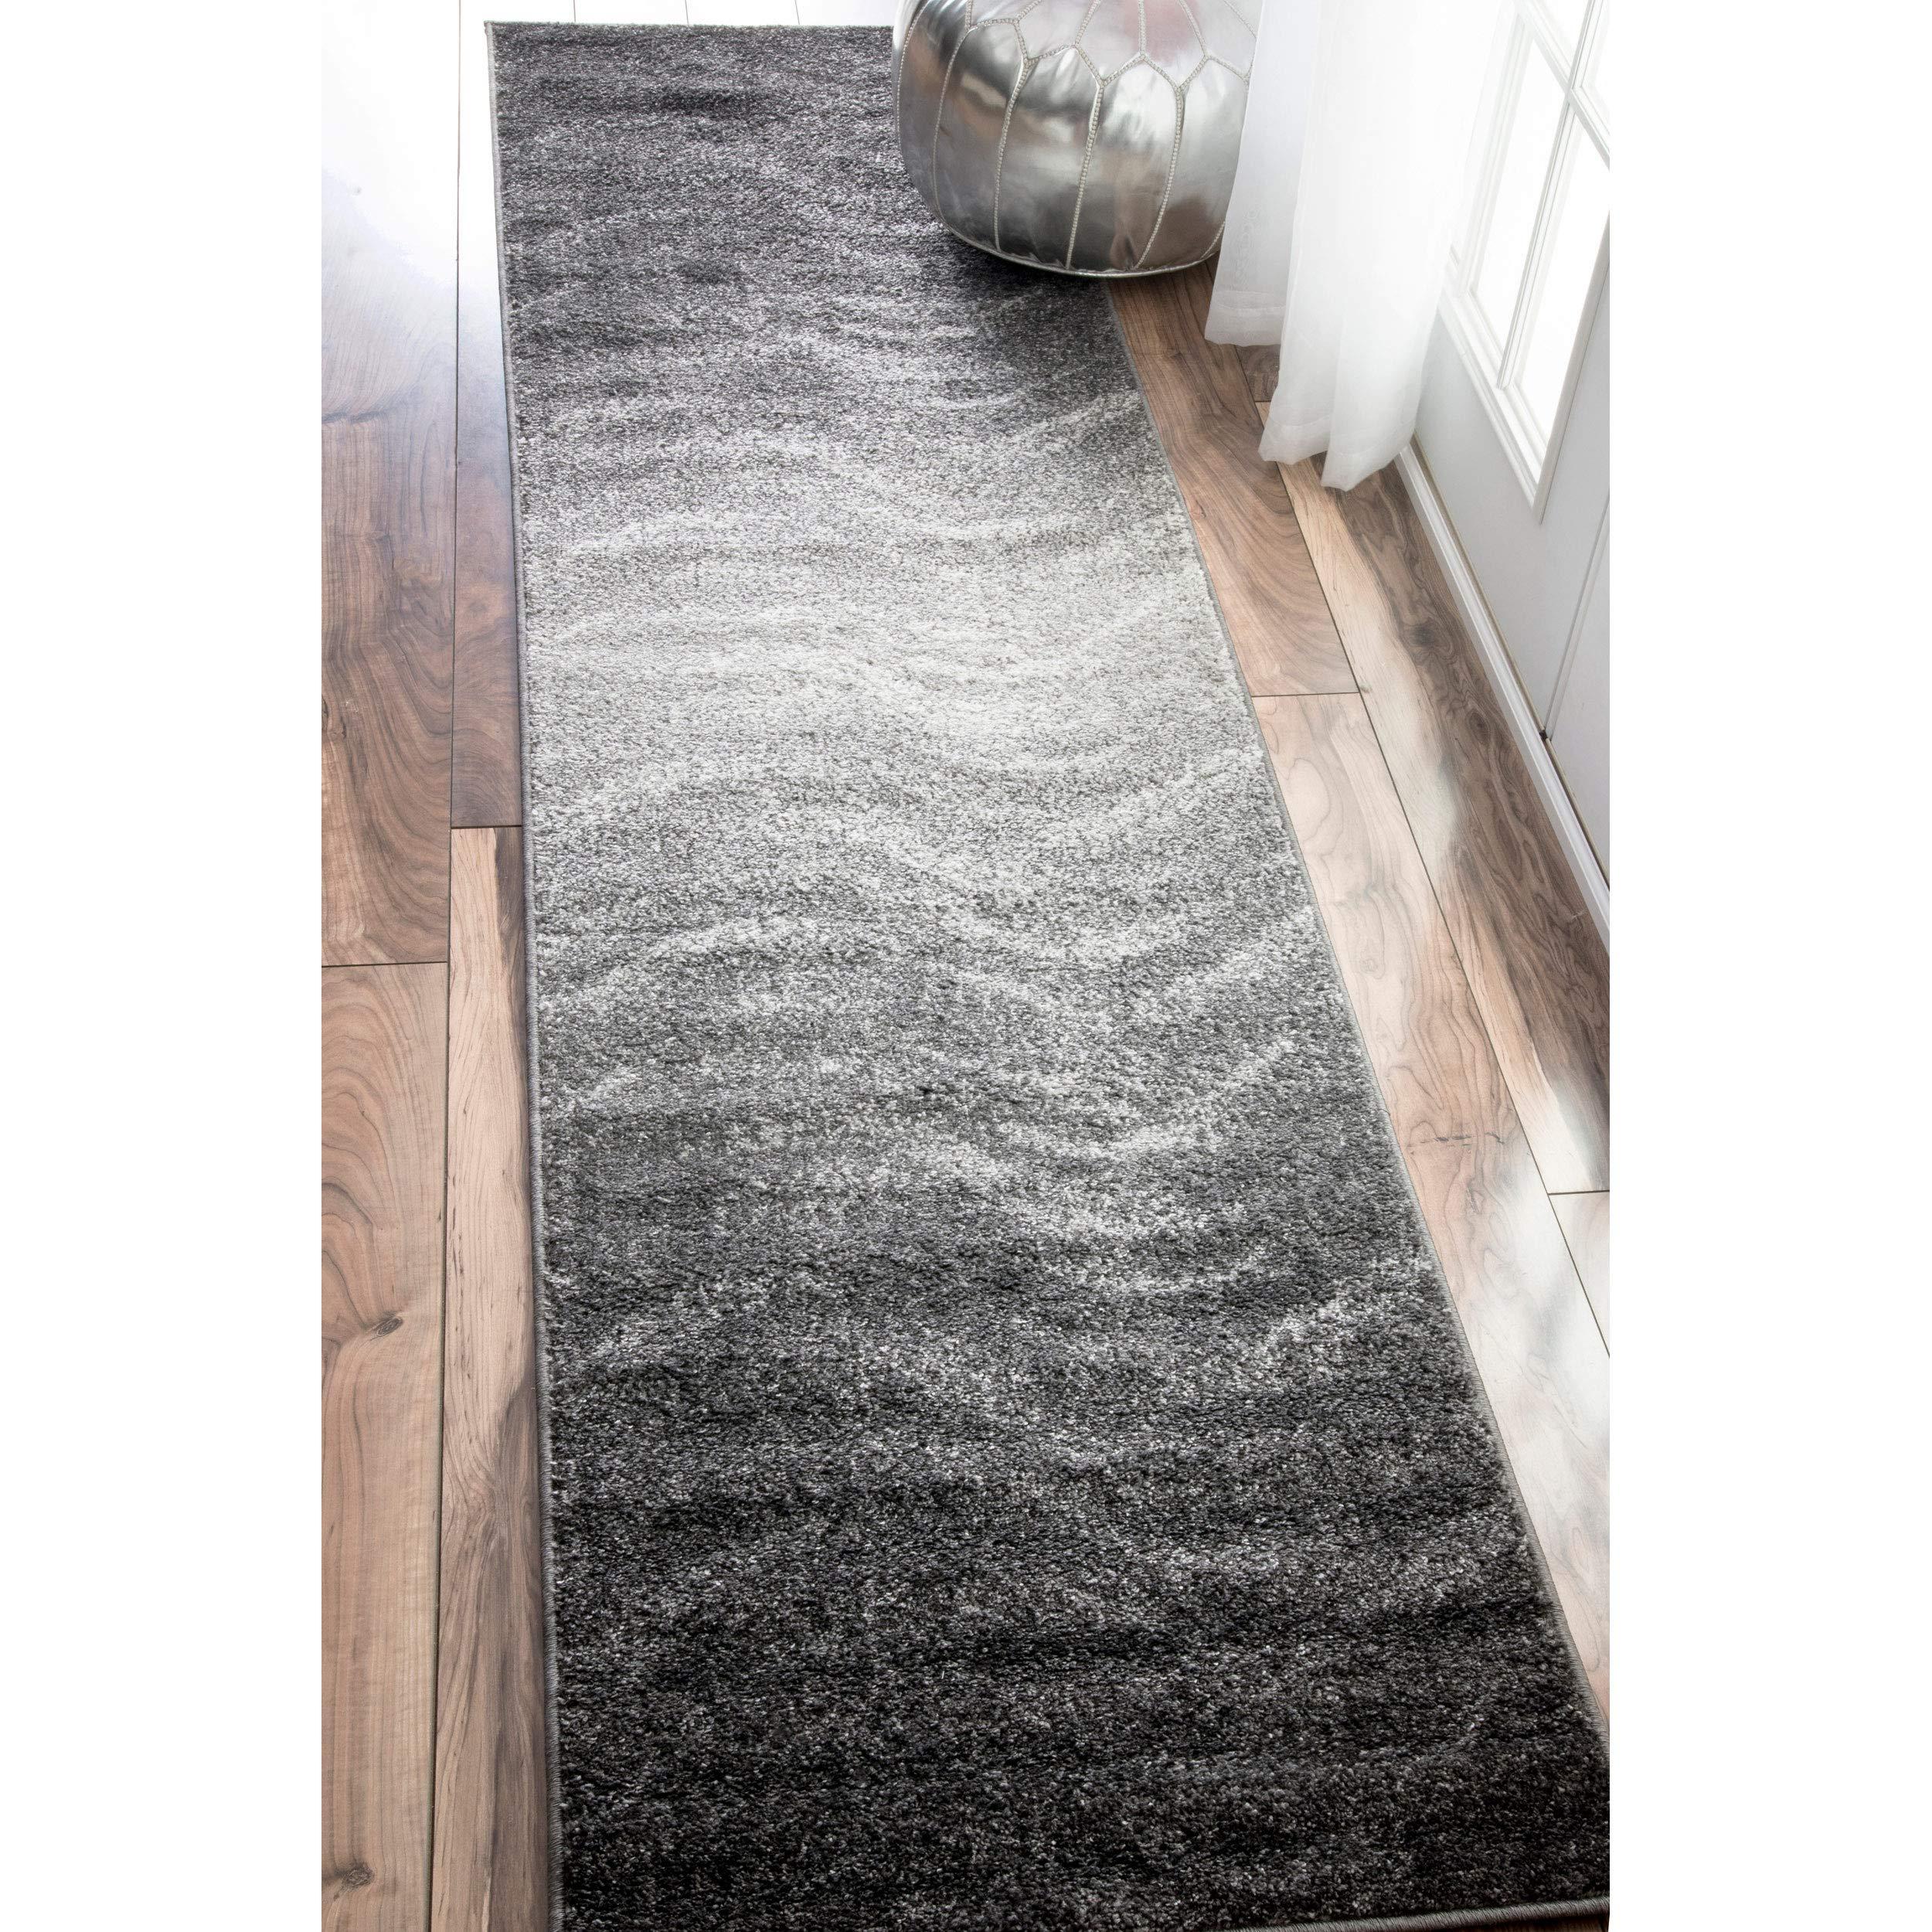 nuLOOM Julene Contemporary Runner Rug, 2' 6'' x 12', Grey by nuLOOM